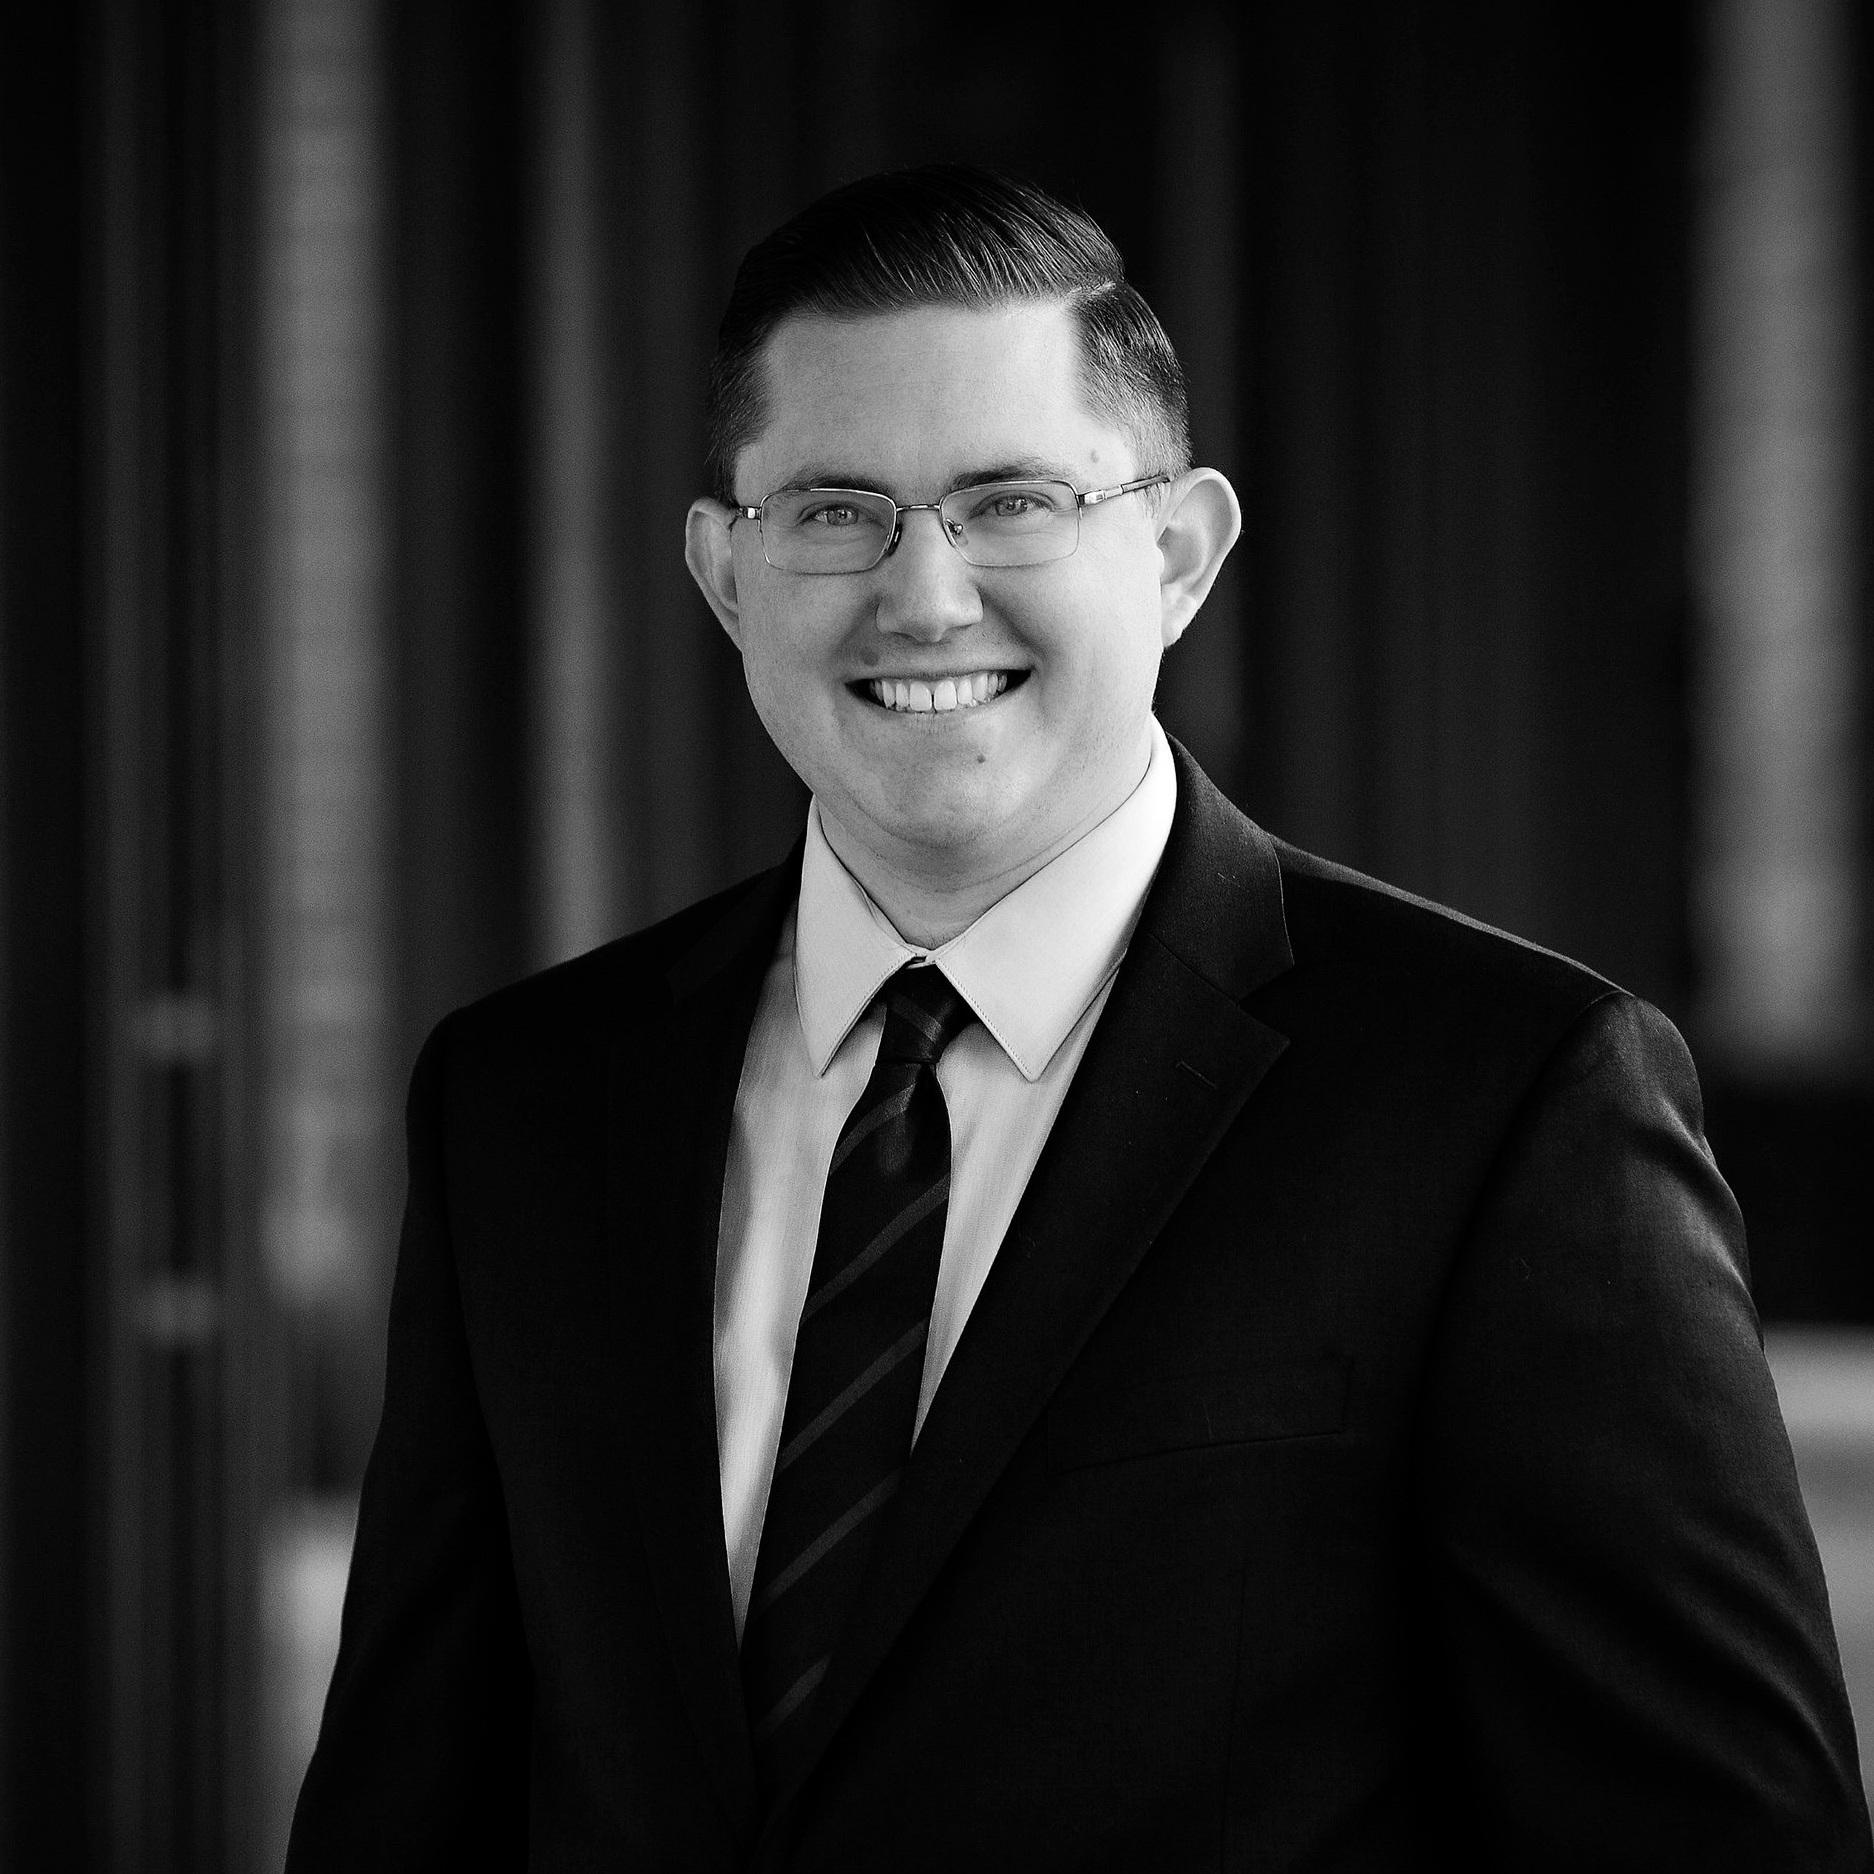 Weston Pickens | Senior Accountant